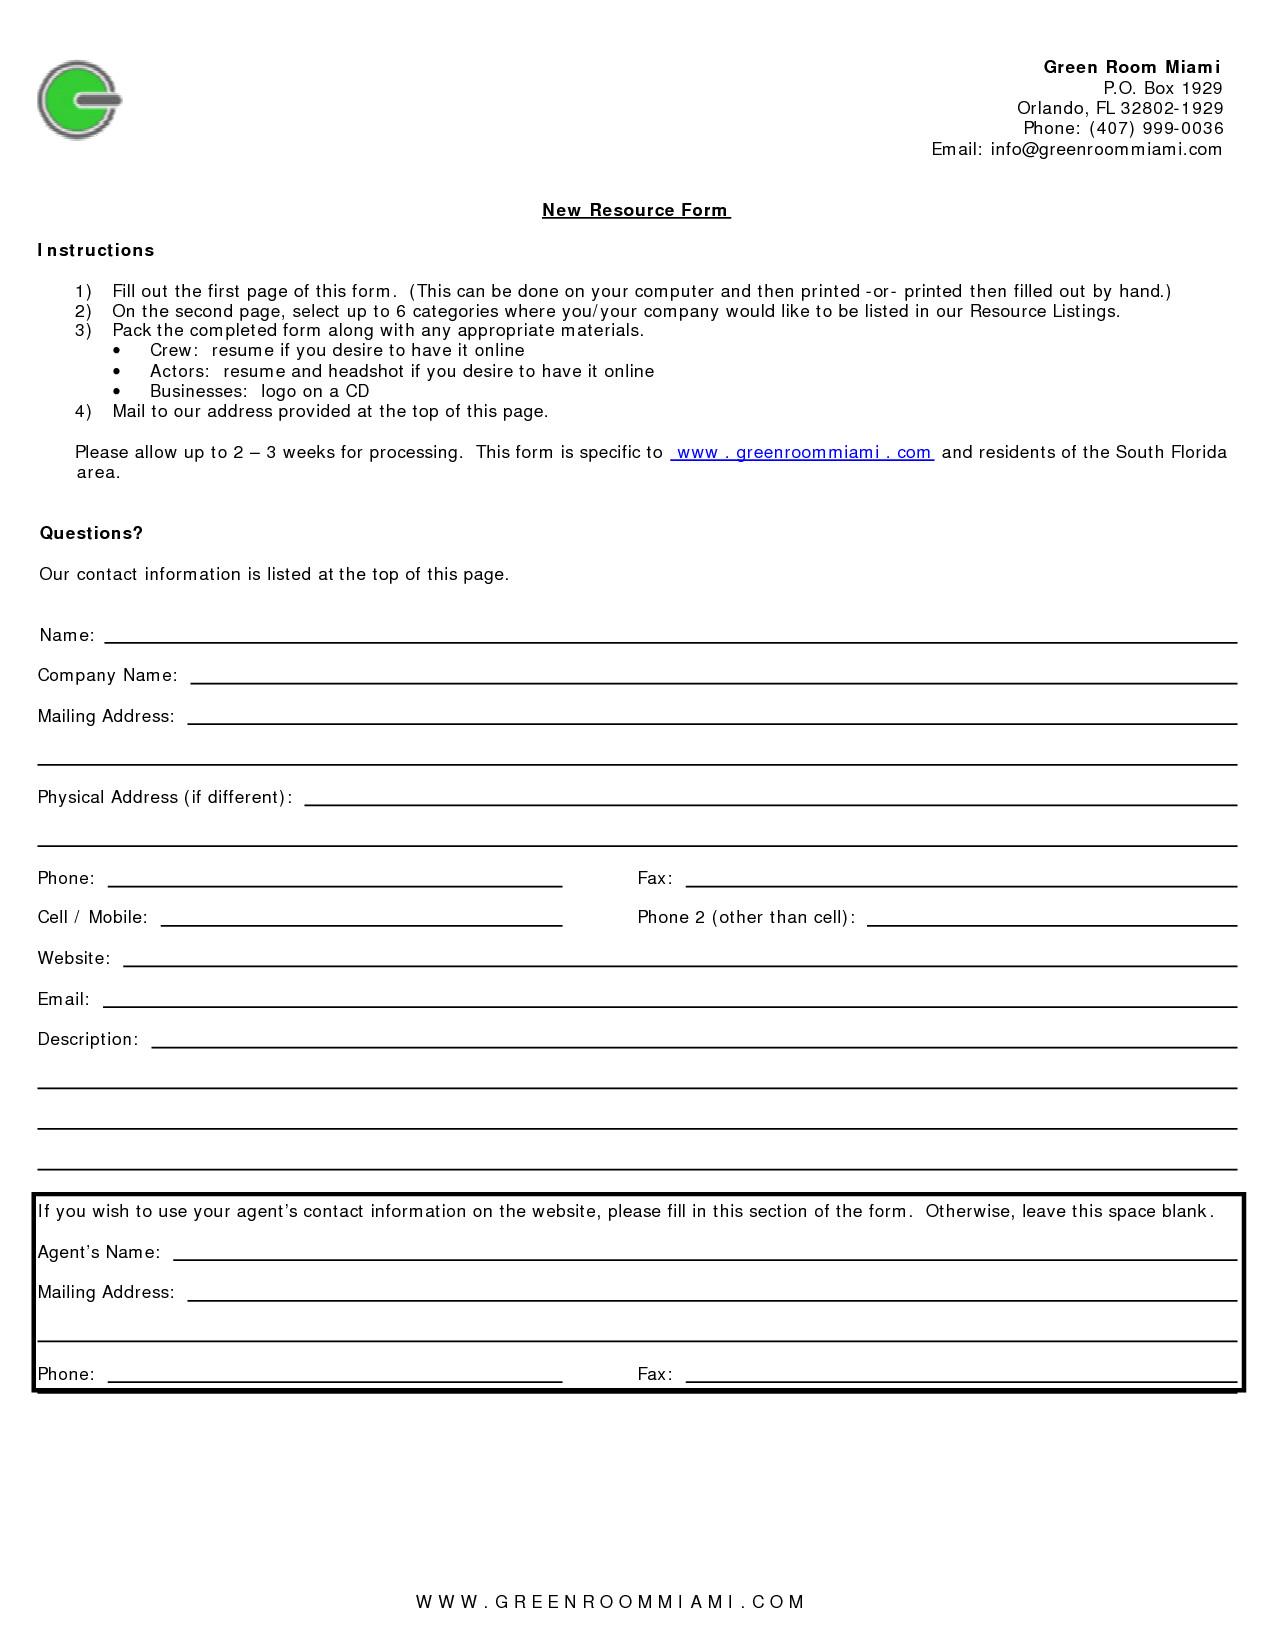 Fill In Resume Template Pdf Fill In the Blank Resume Pdf Umecareer